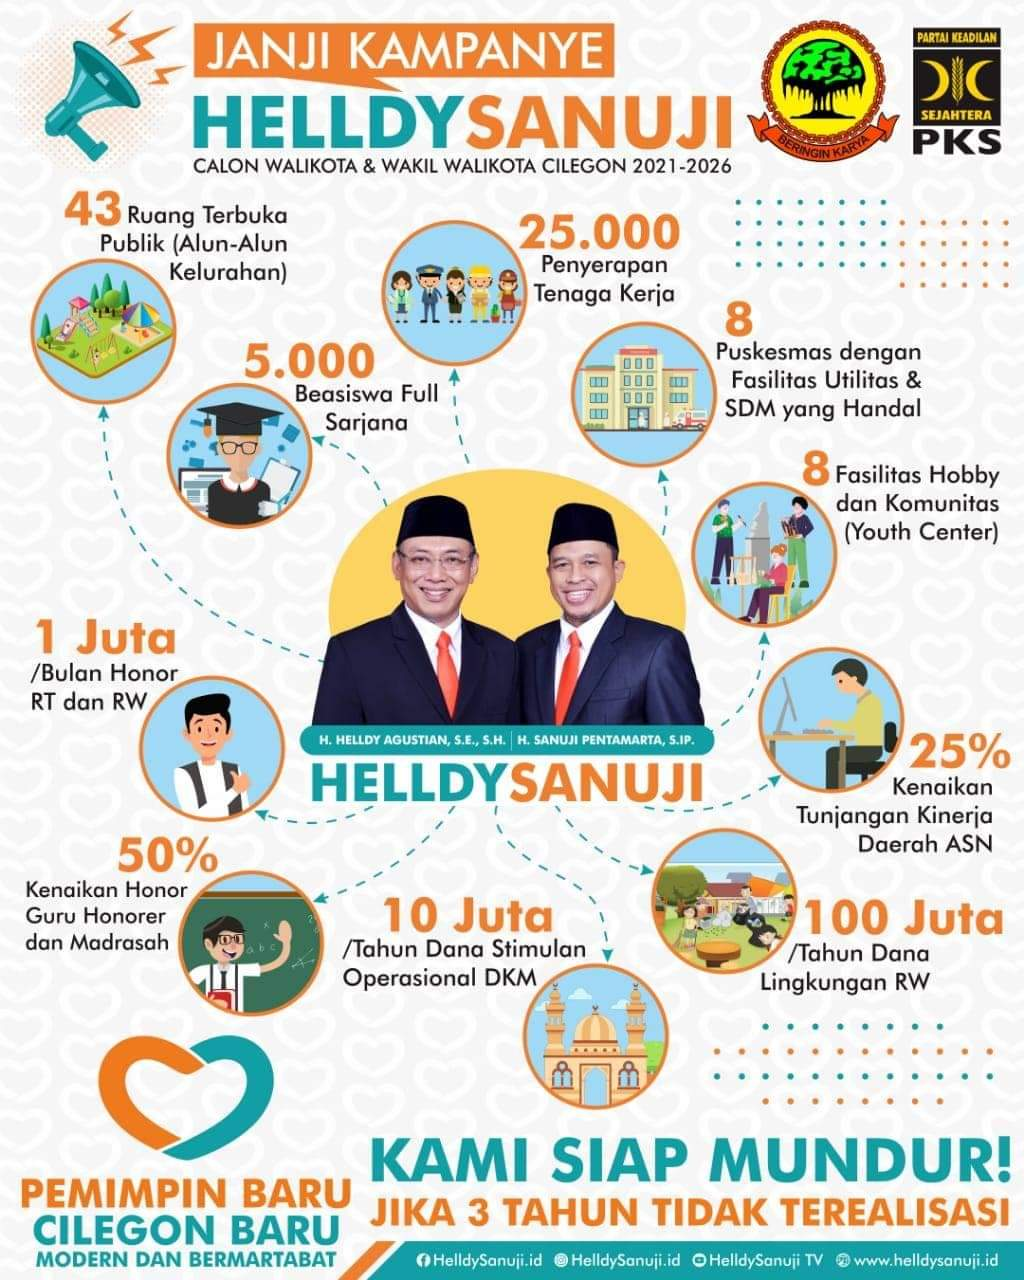 Helldy-Sanuji